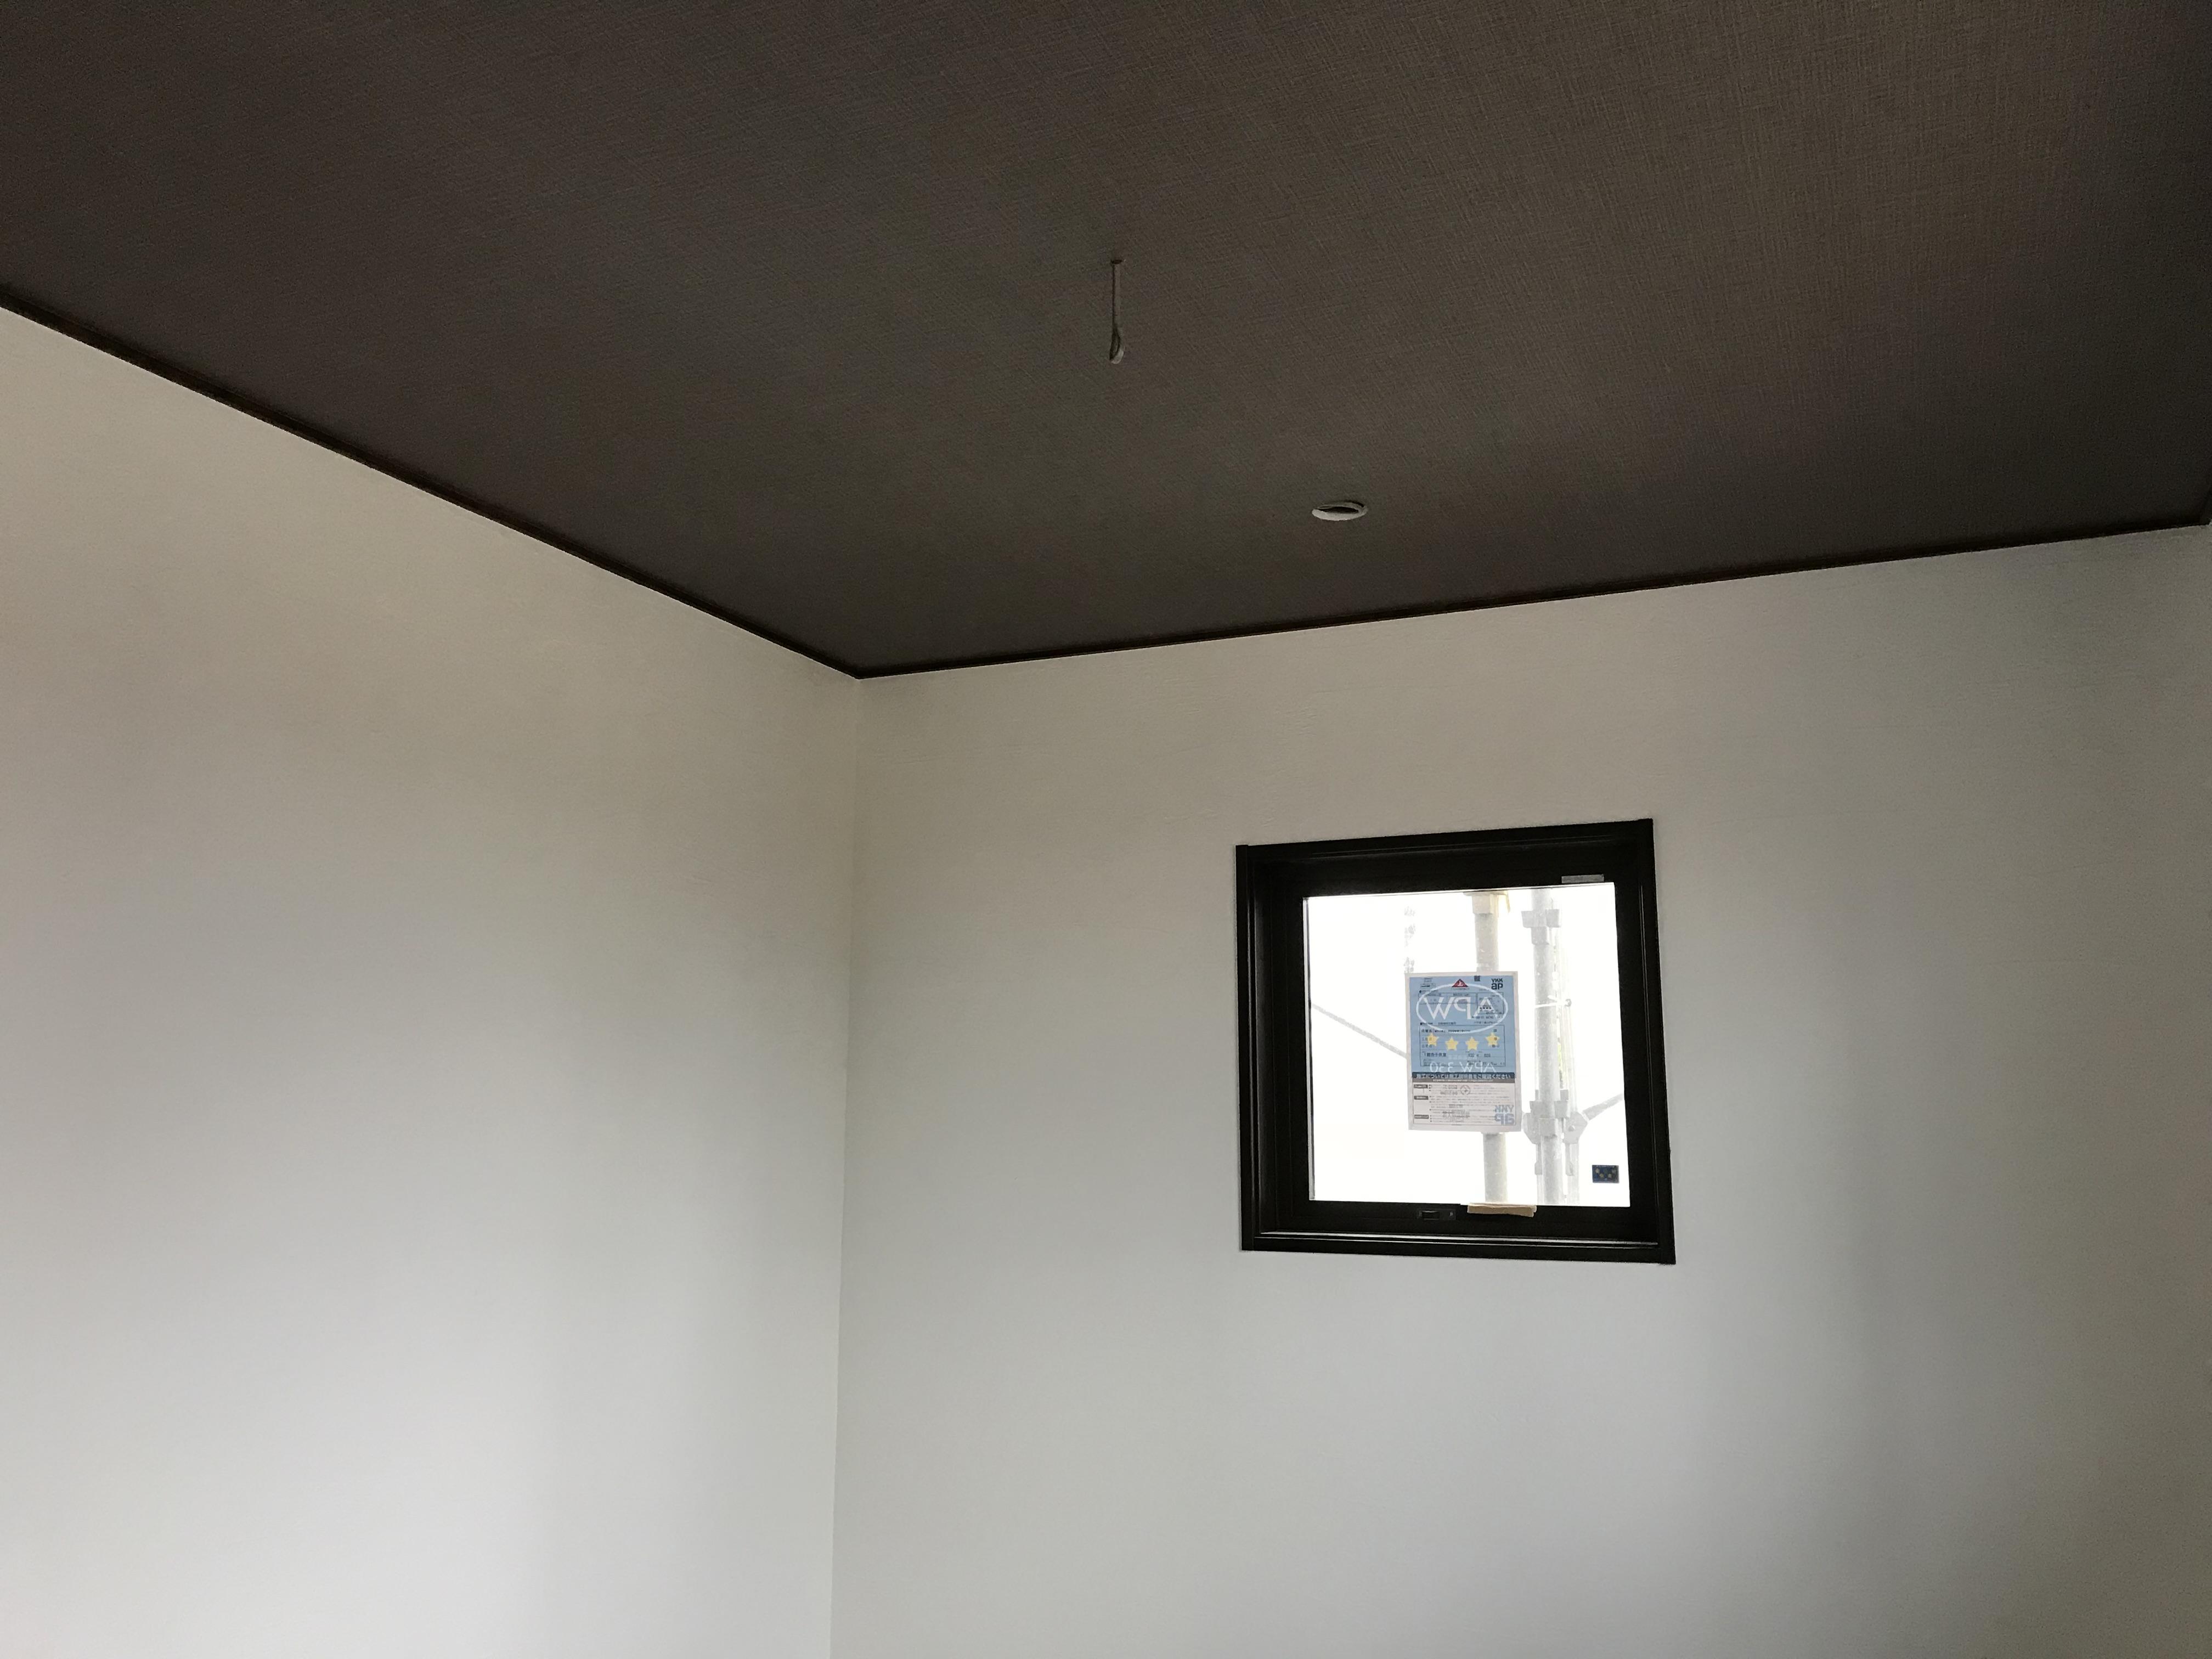 IMG_0121 - 坂井工務店 | 山口県山口市佐山 | 木造住宅、注文住宅の工務店